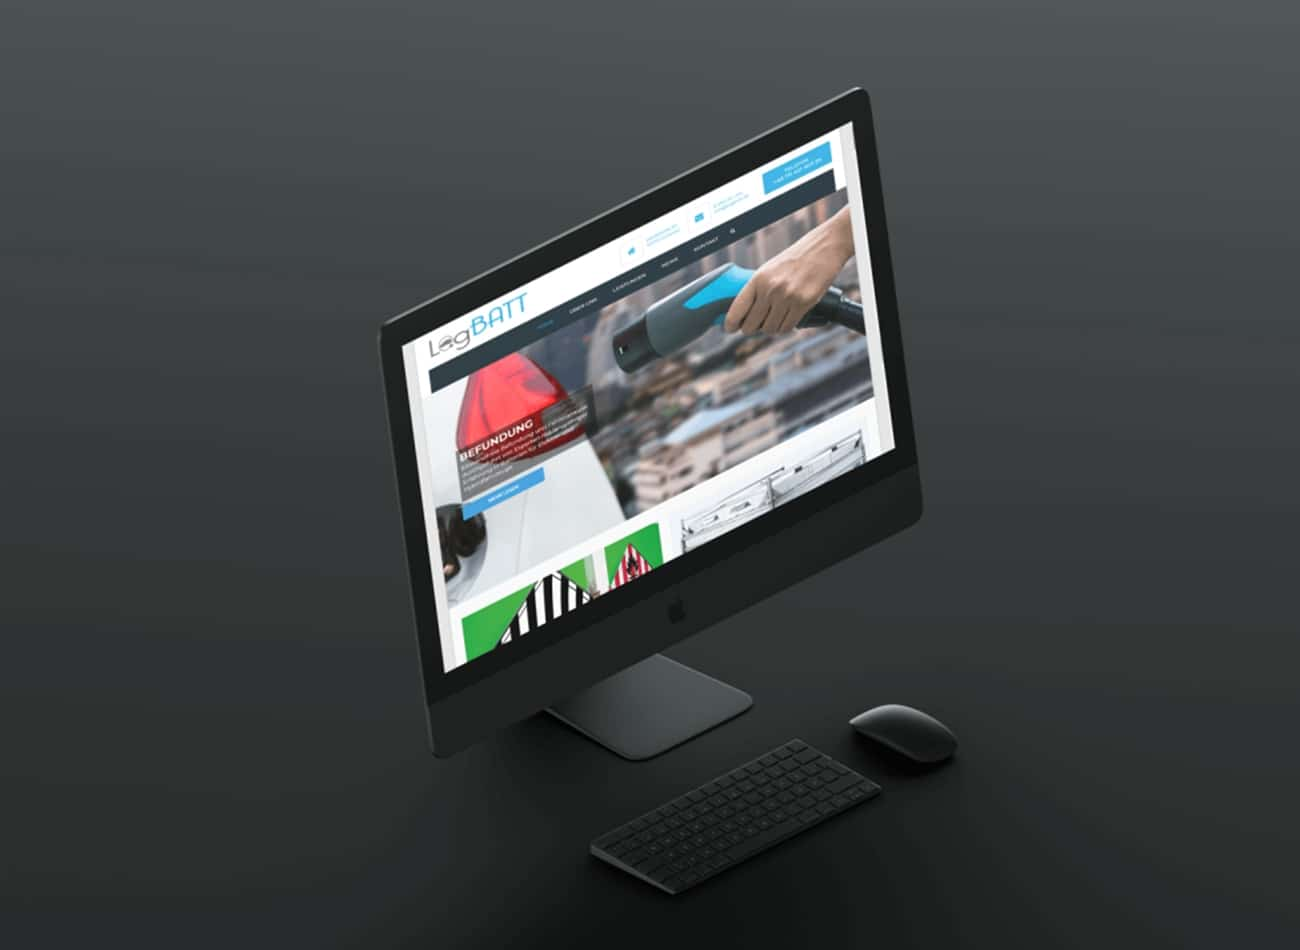 logbatt-gmbh-liebespixel-referenz-portfolio-kirchheim-webdesign-logo-print